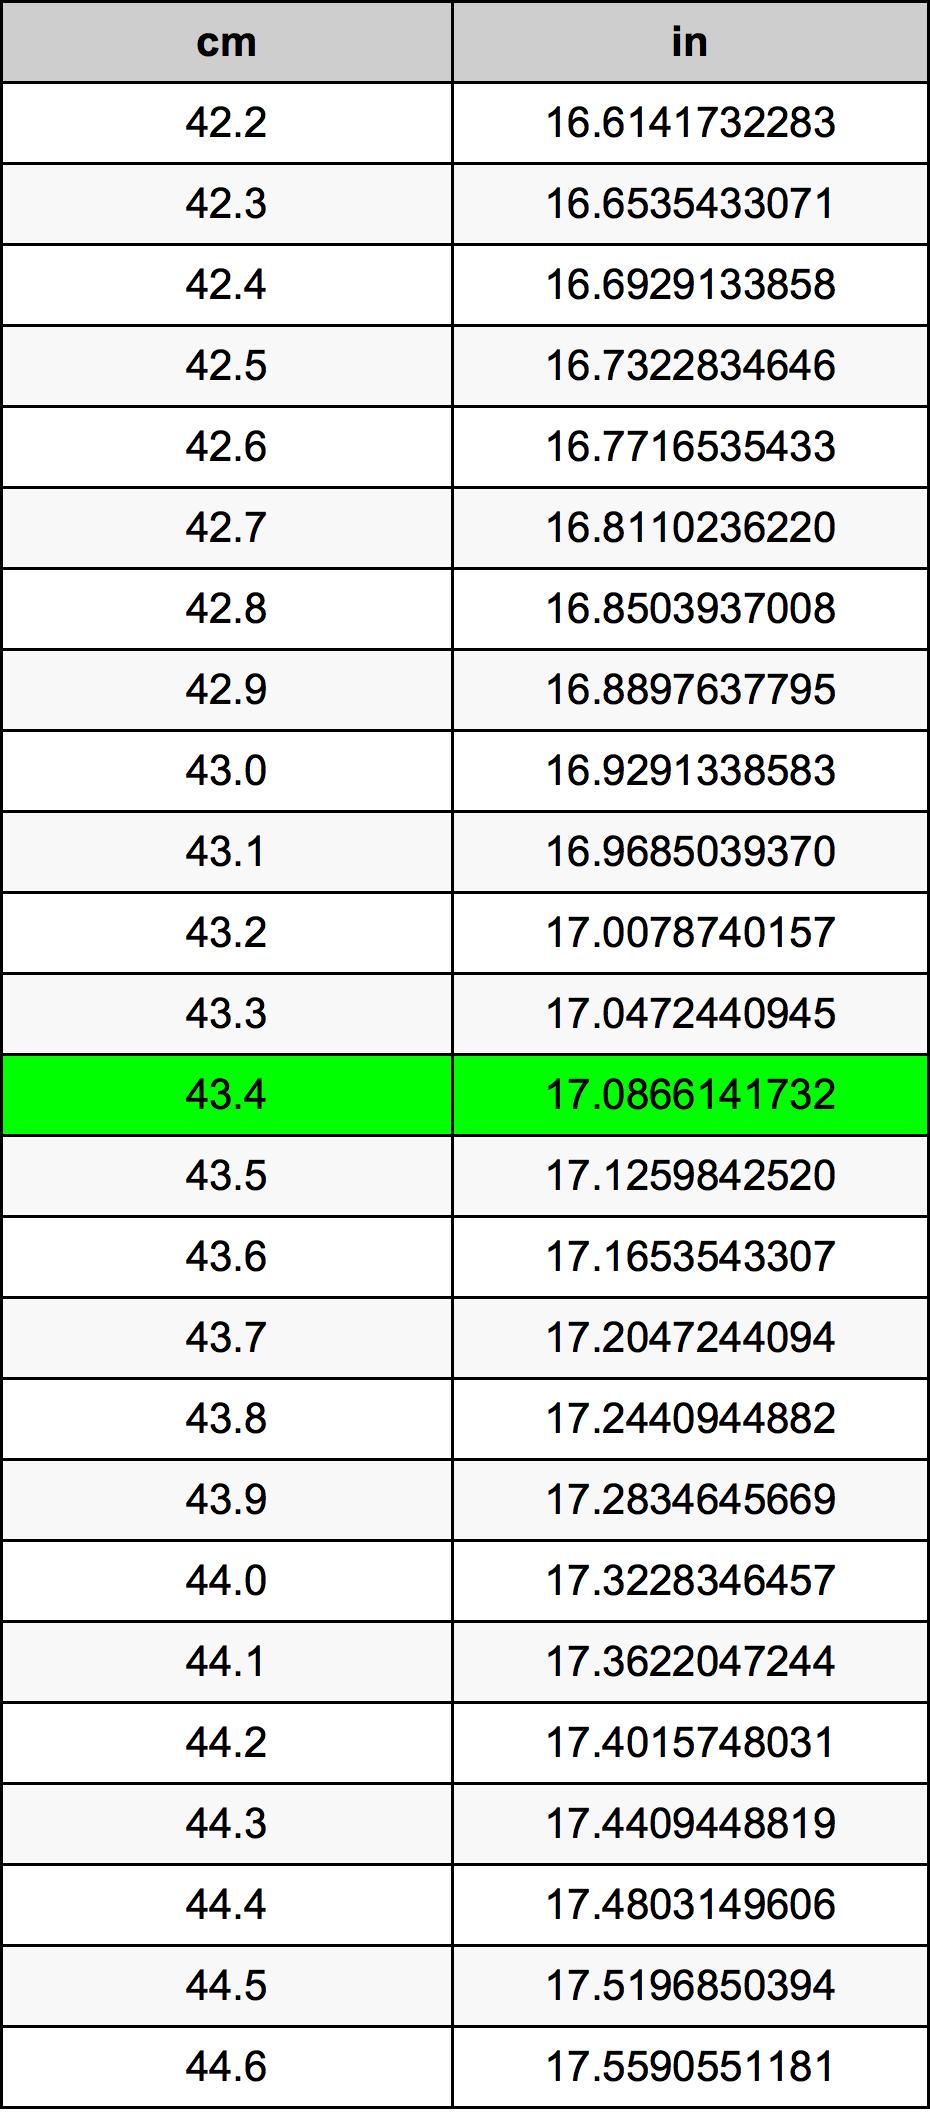 43.4 Centimeter konverteringstabellen